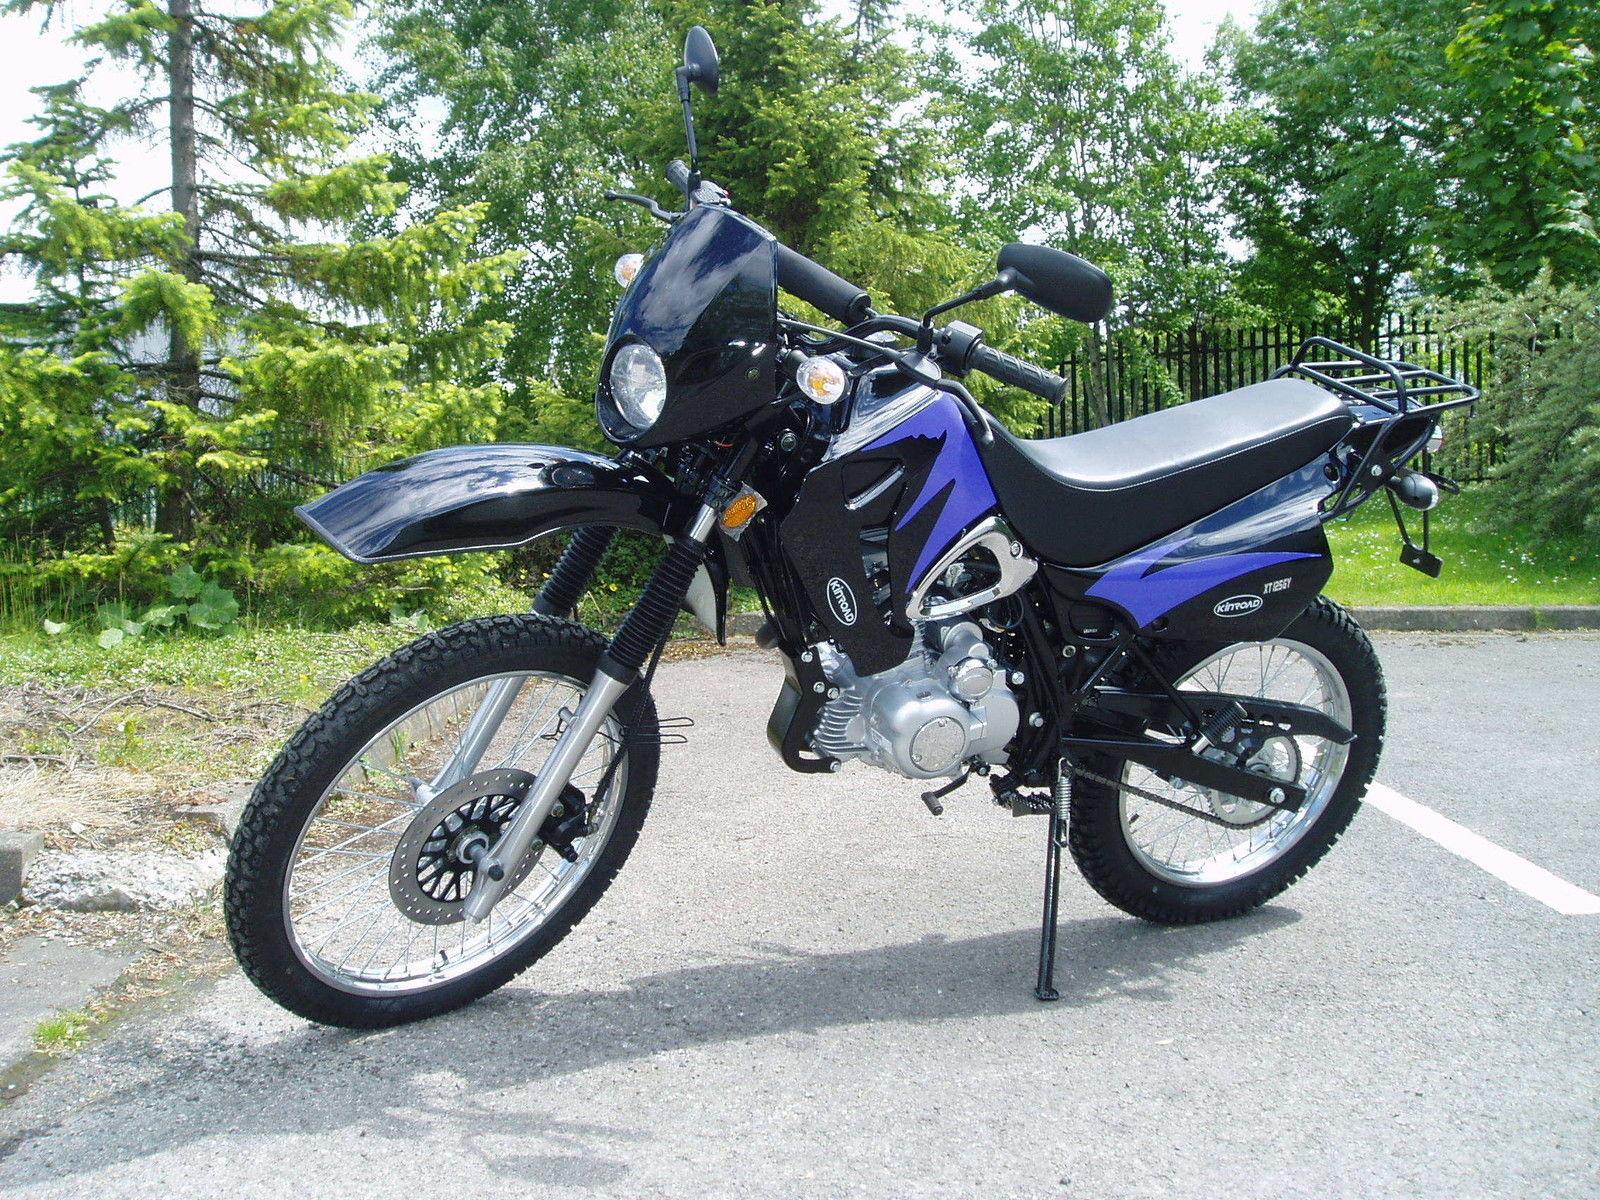 Kinroad XT125 Explorer Motorcycle - Learner Legal 125cc Brand New